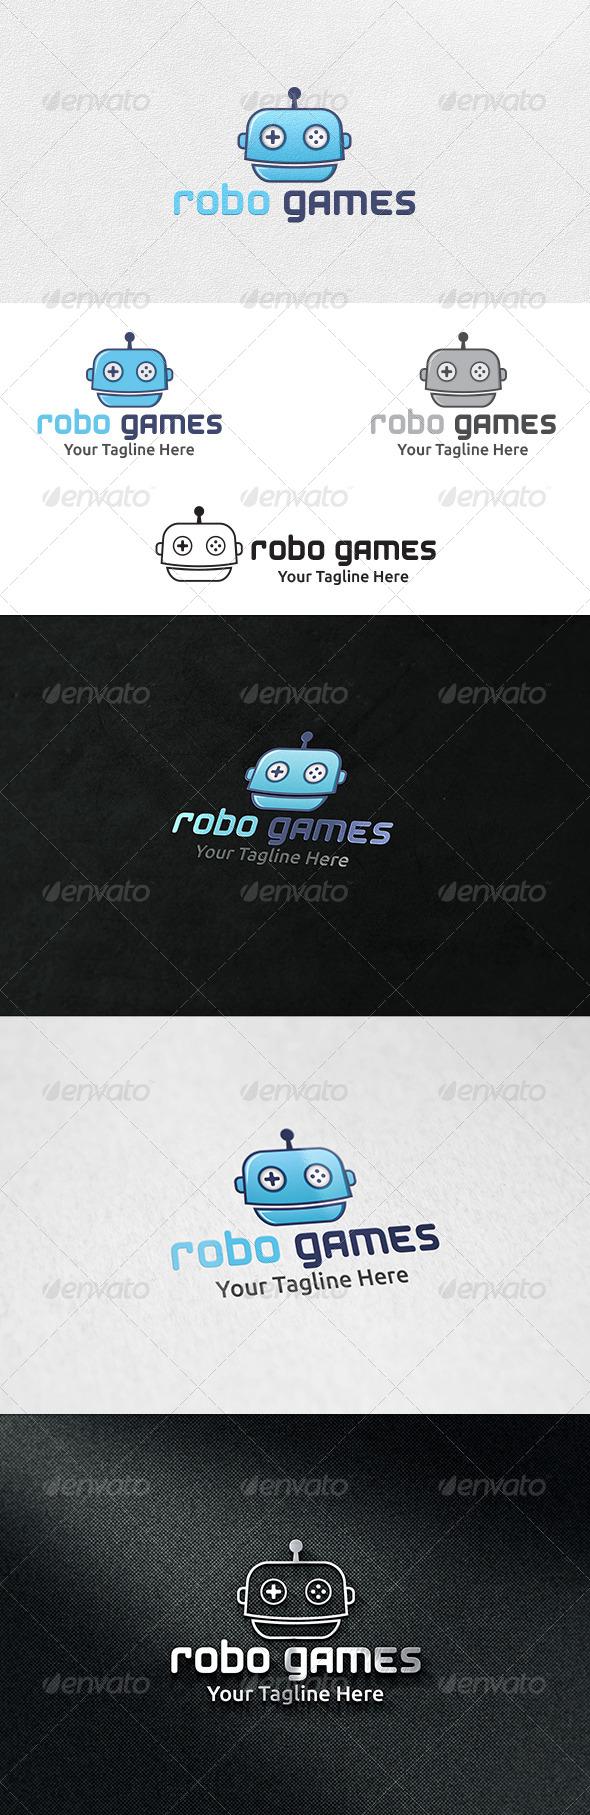 GraphicRiver Robot Games Logo Template 6502129